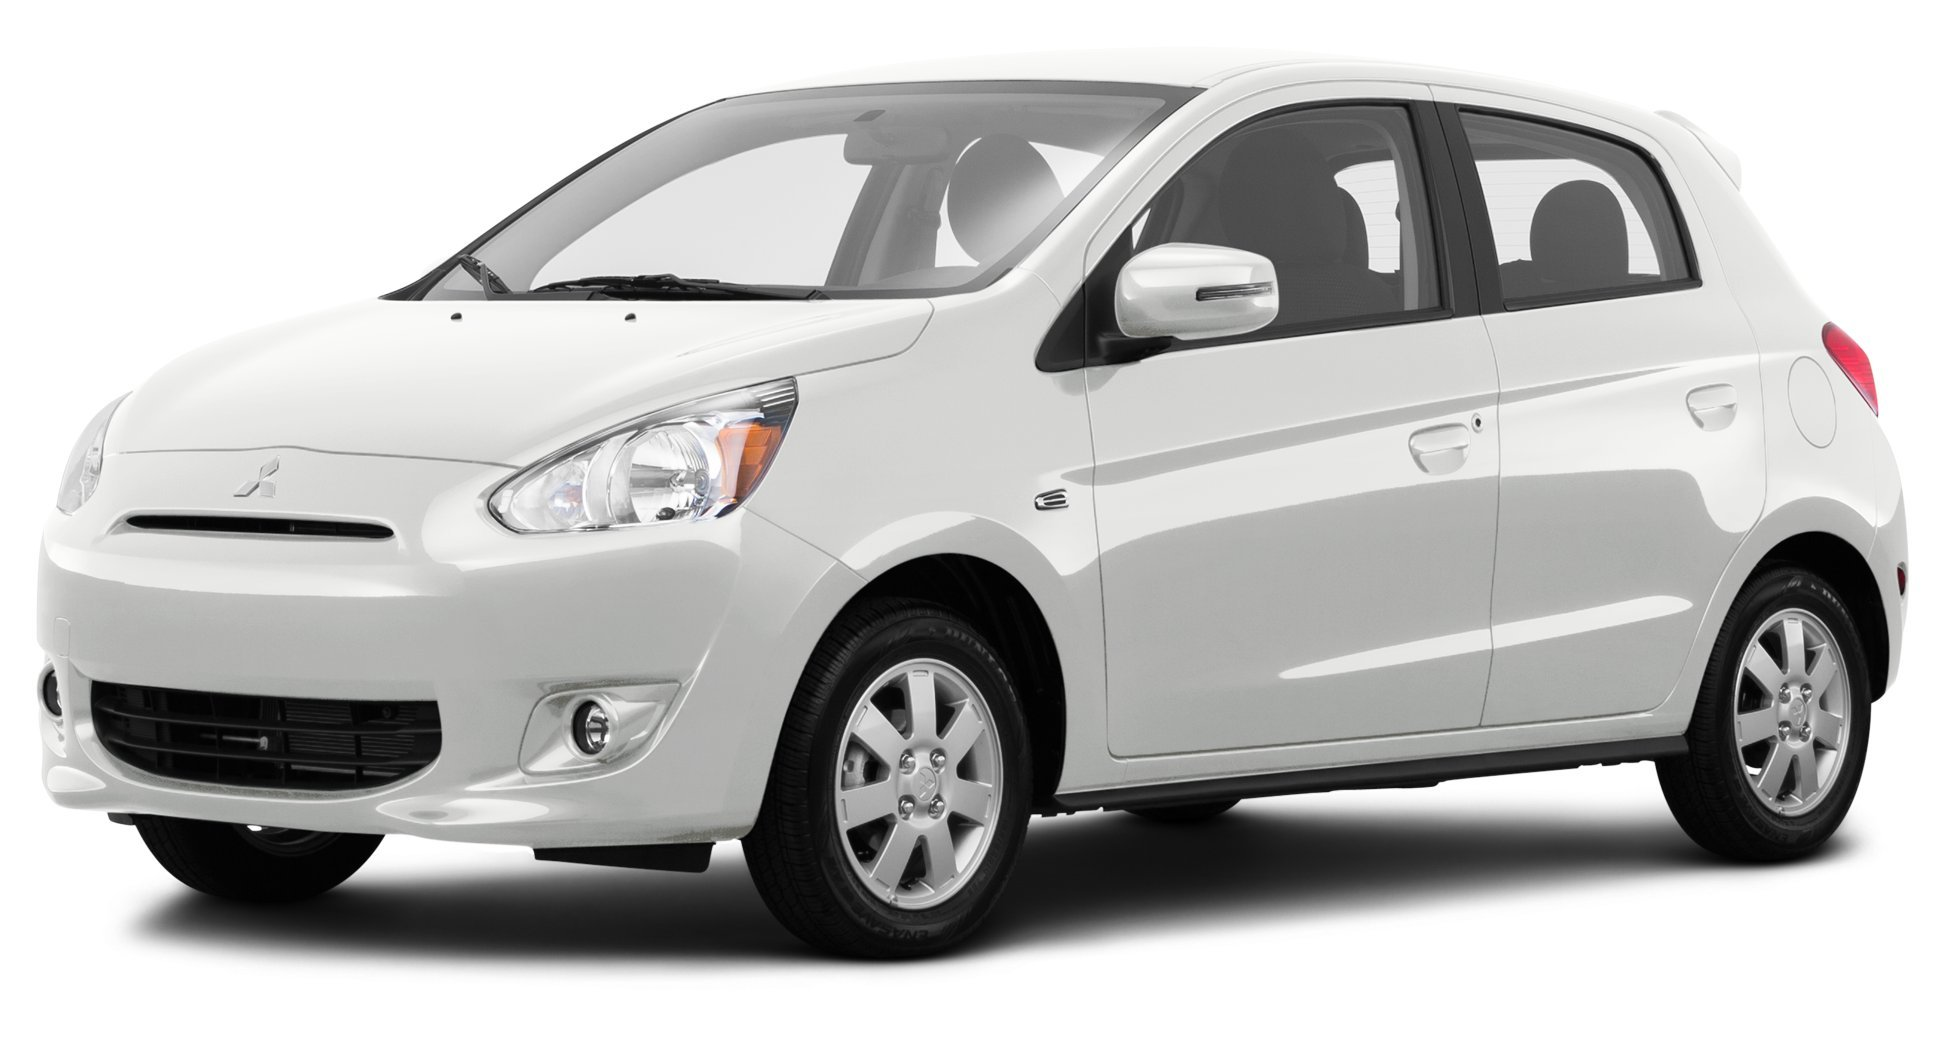 Amazon.com: 2015 Mitsubishi Mirage Reviews, Images, And